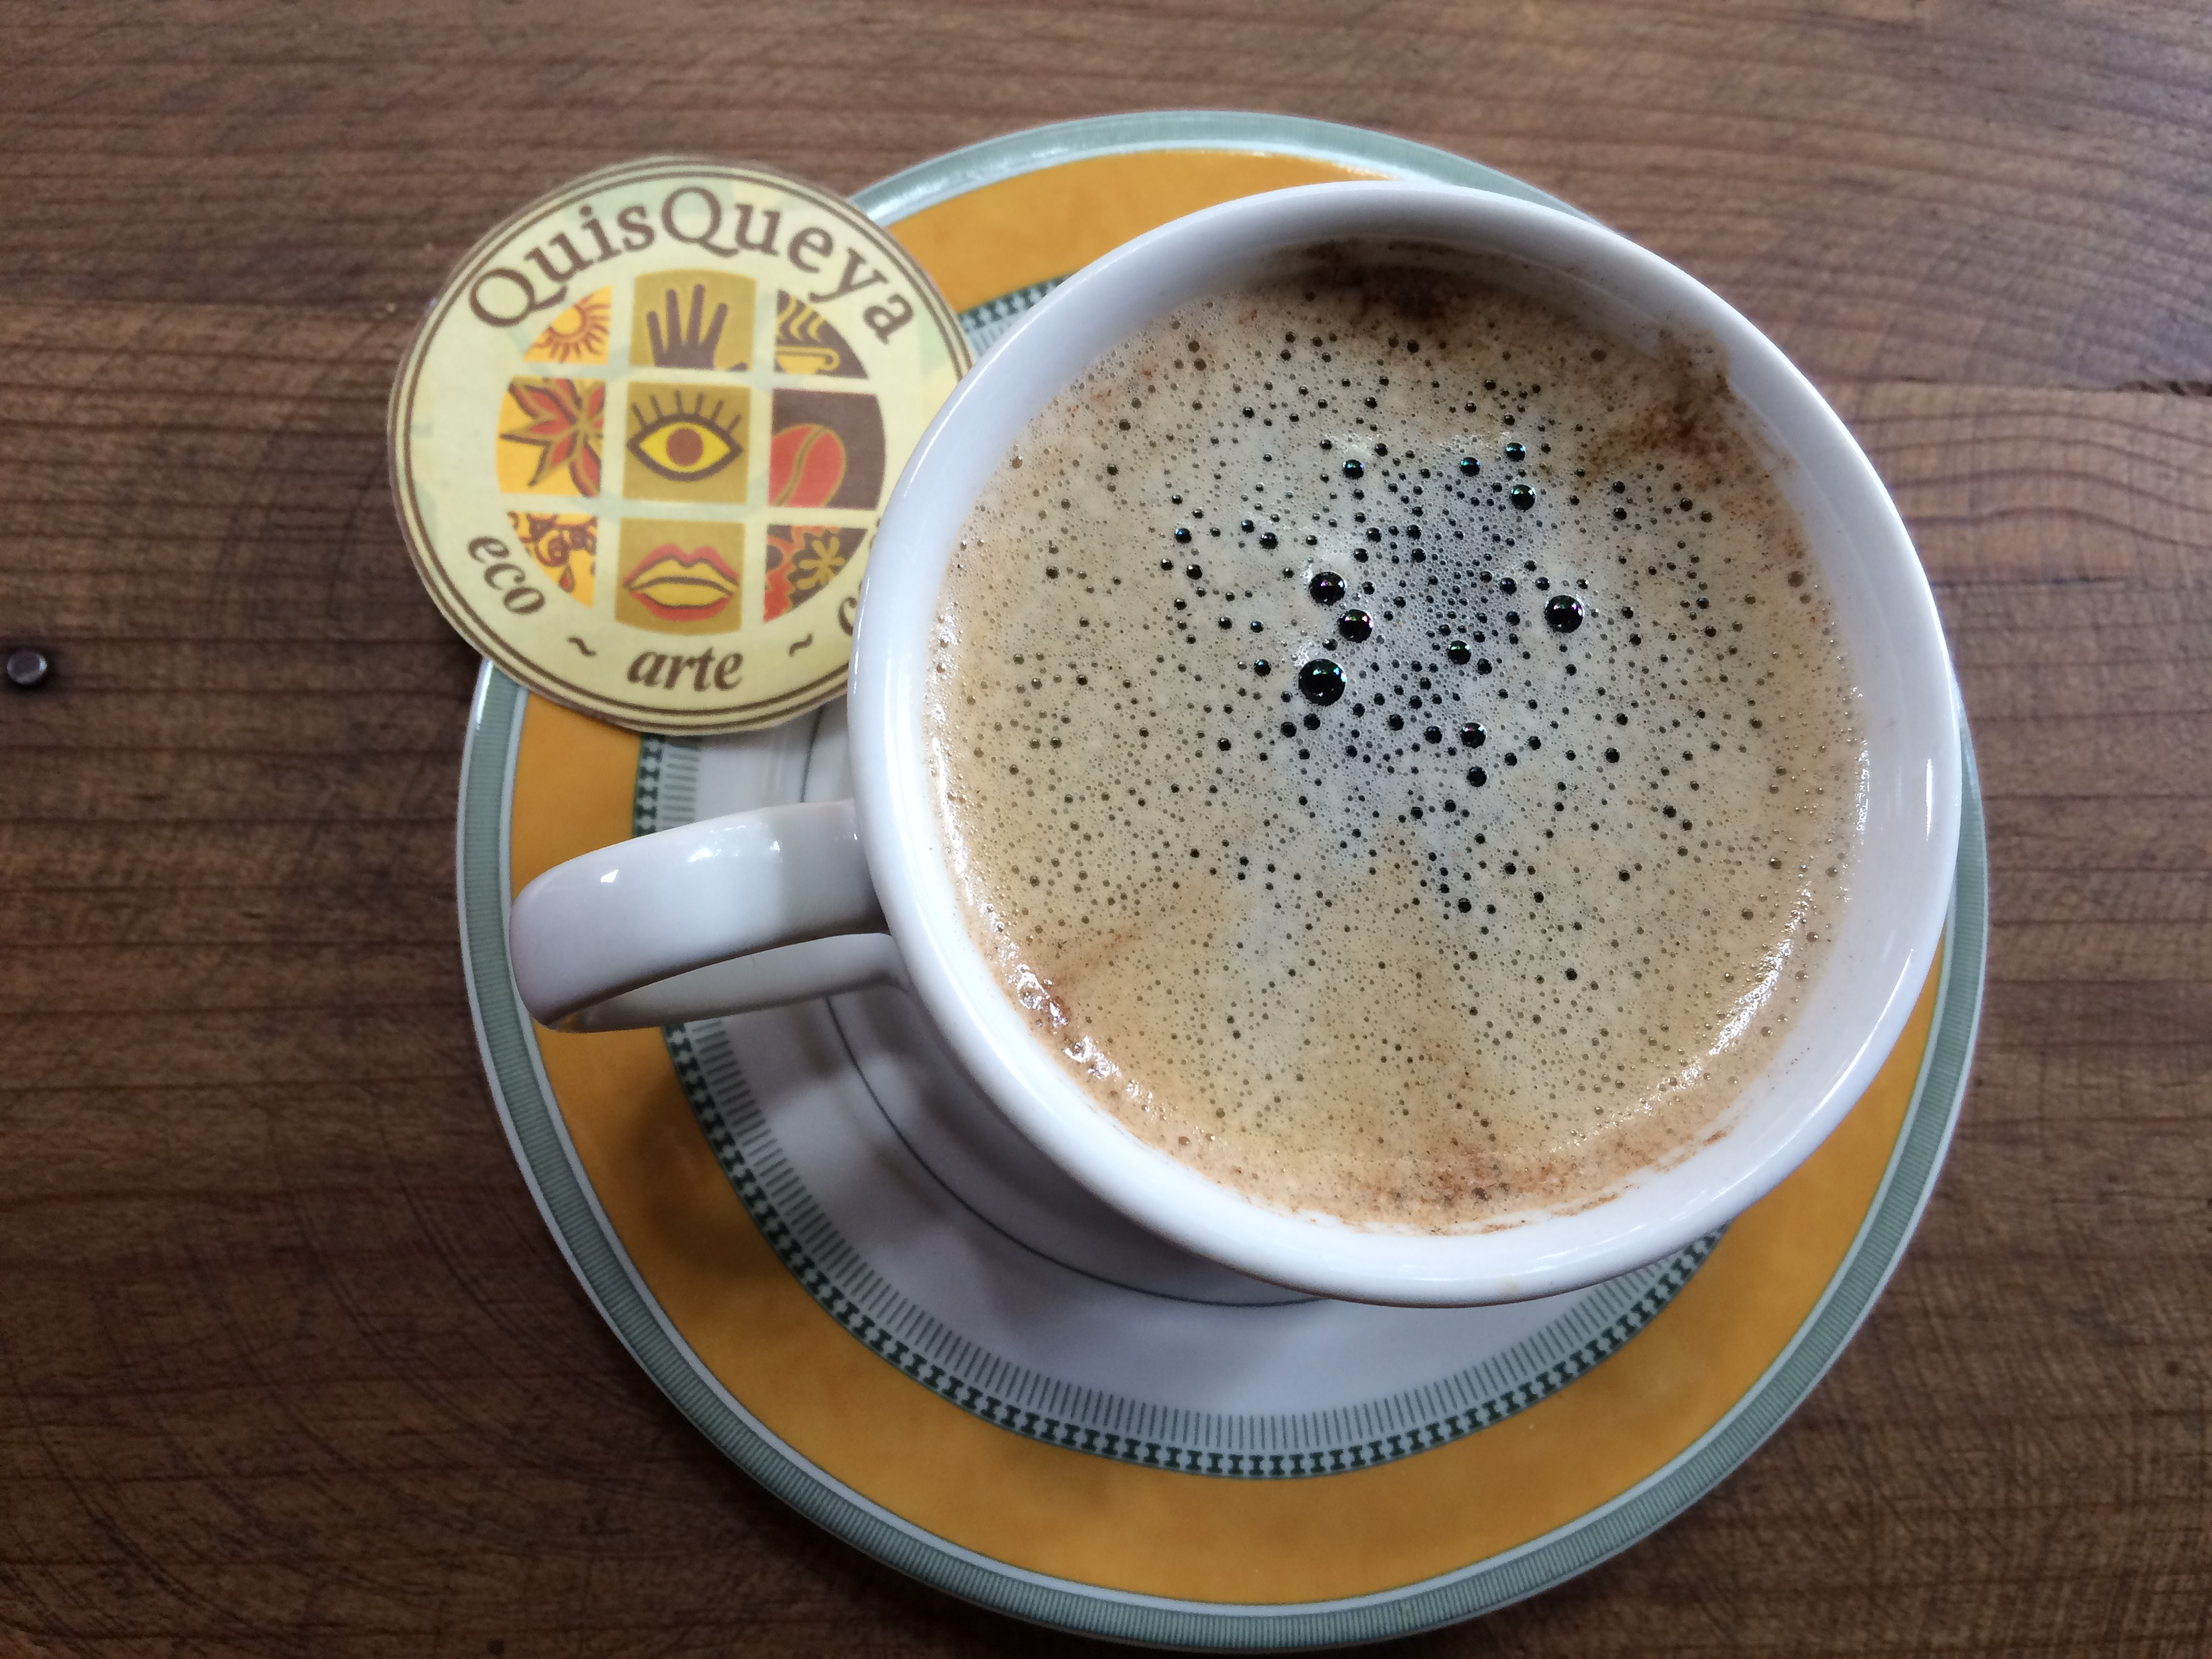 Q: café americano